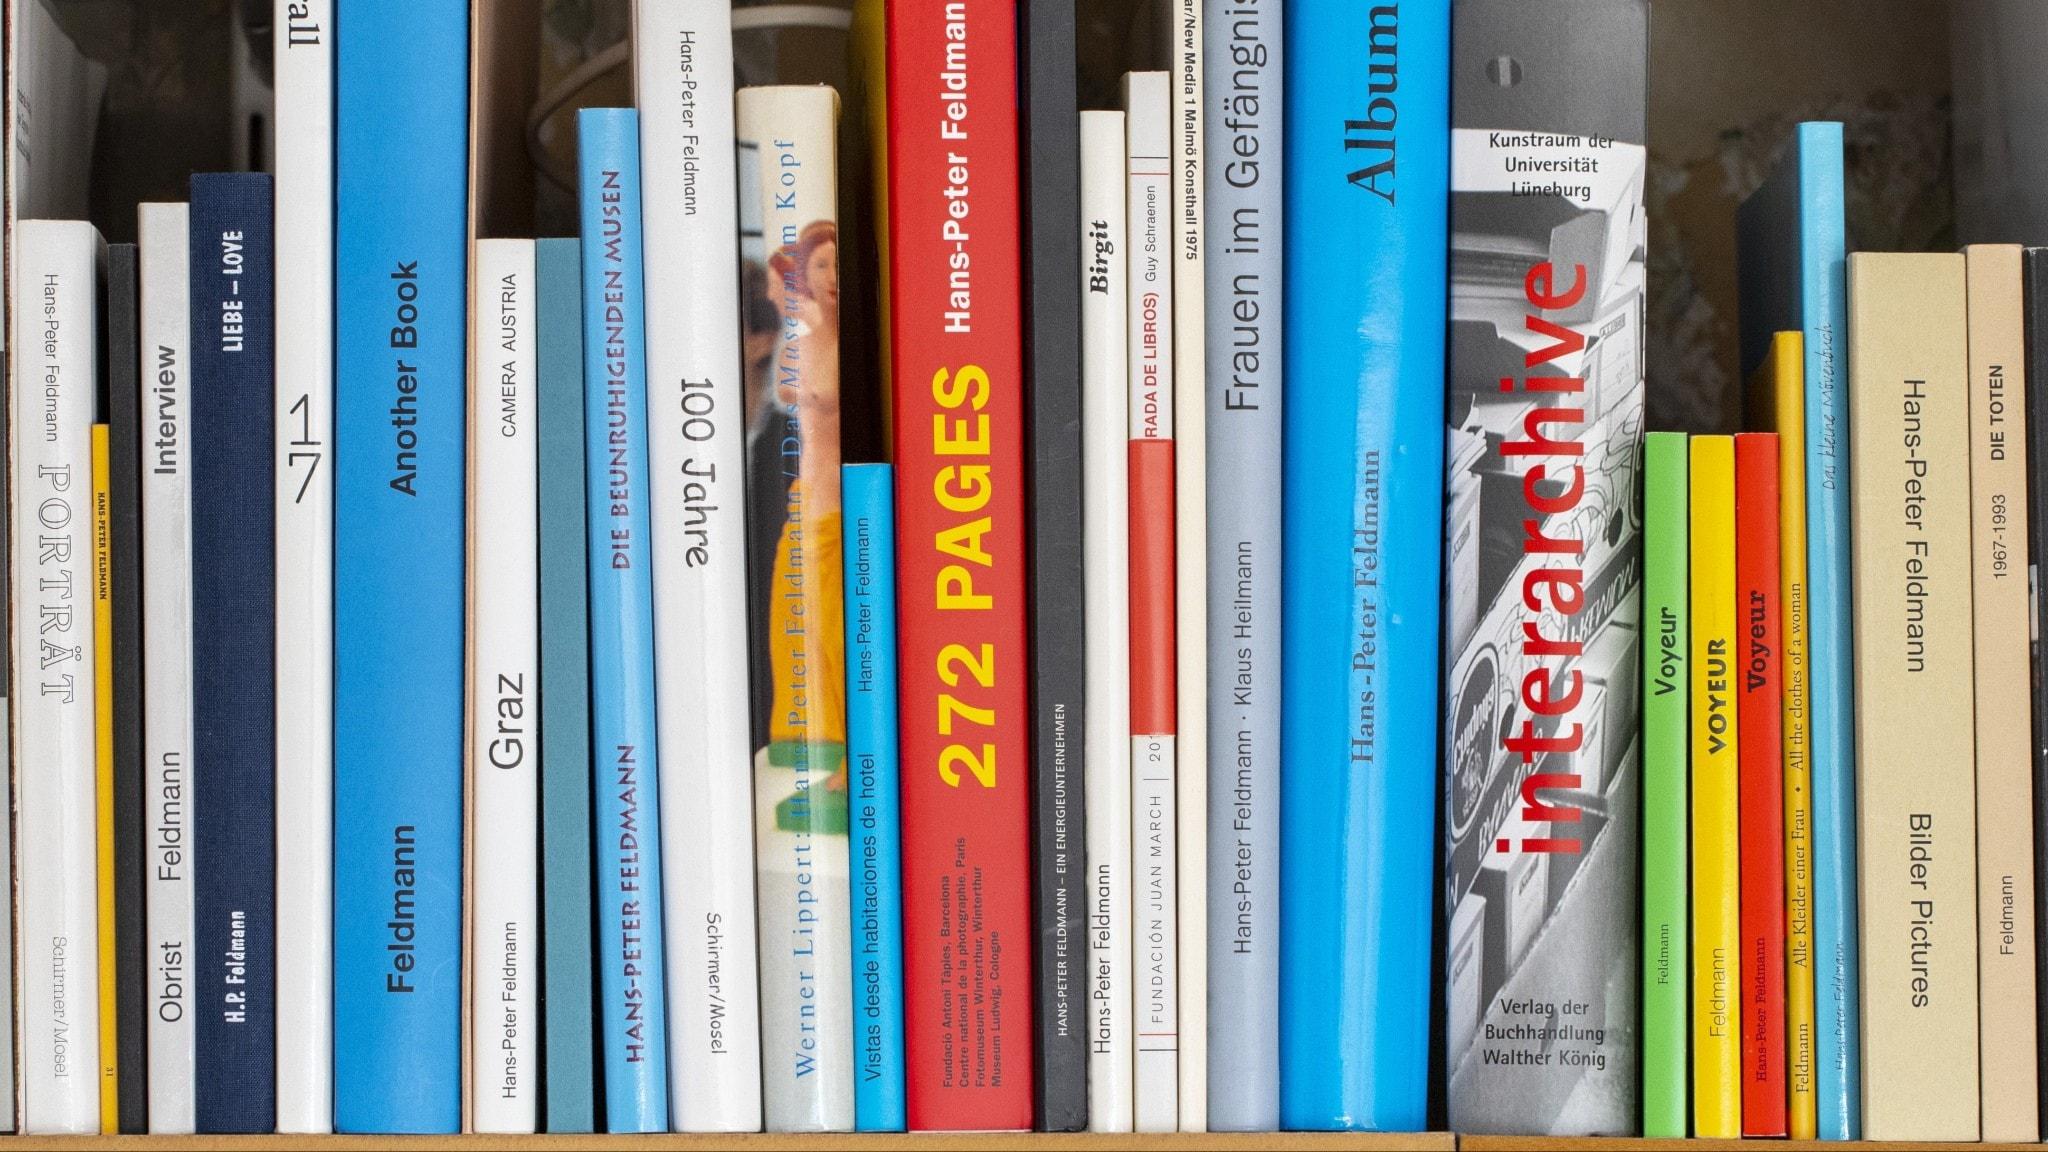 Boken som moderiktig accessoar – en nygammal trend